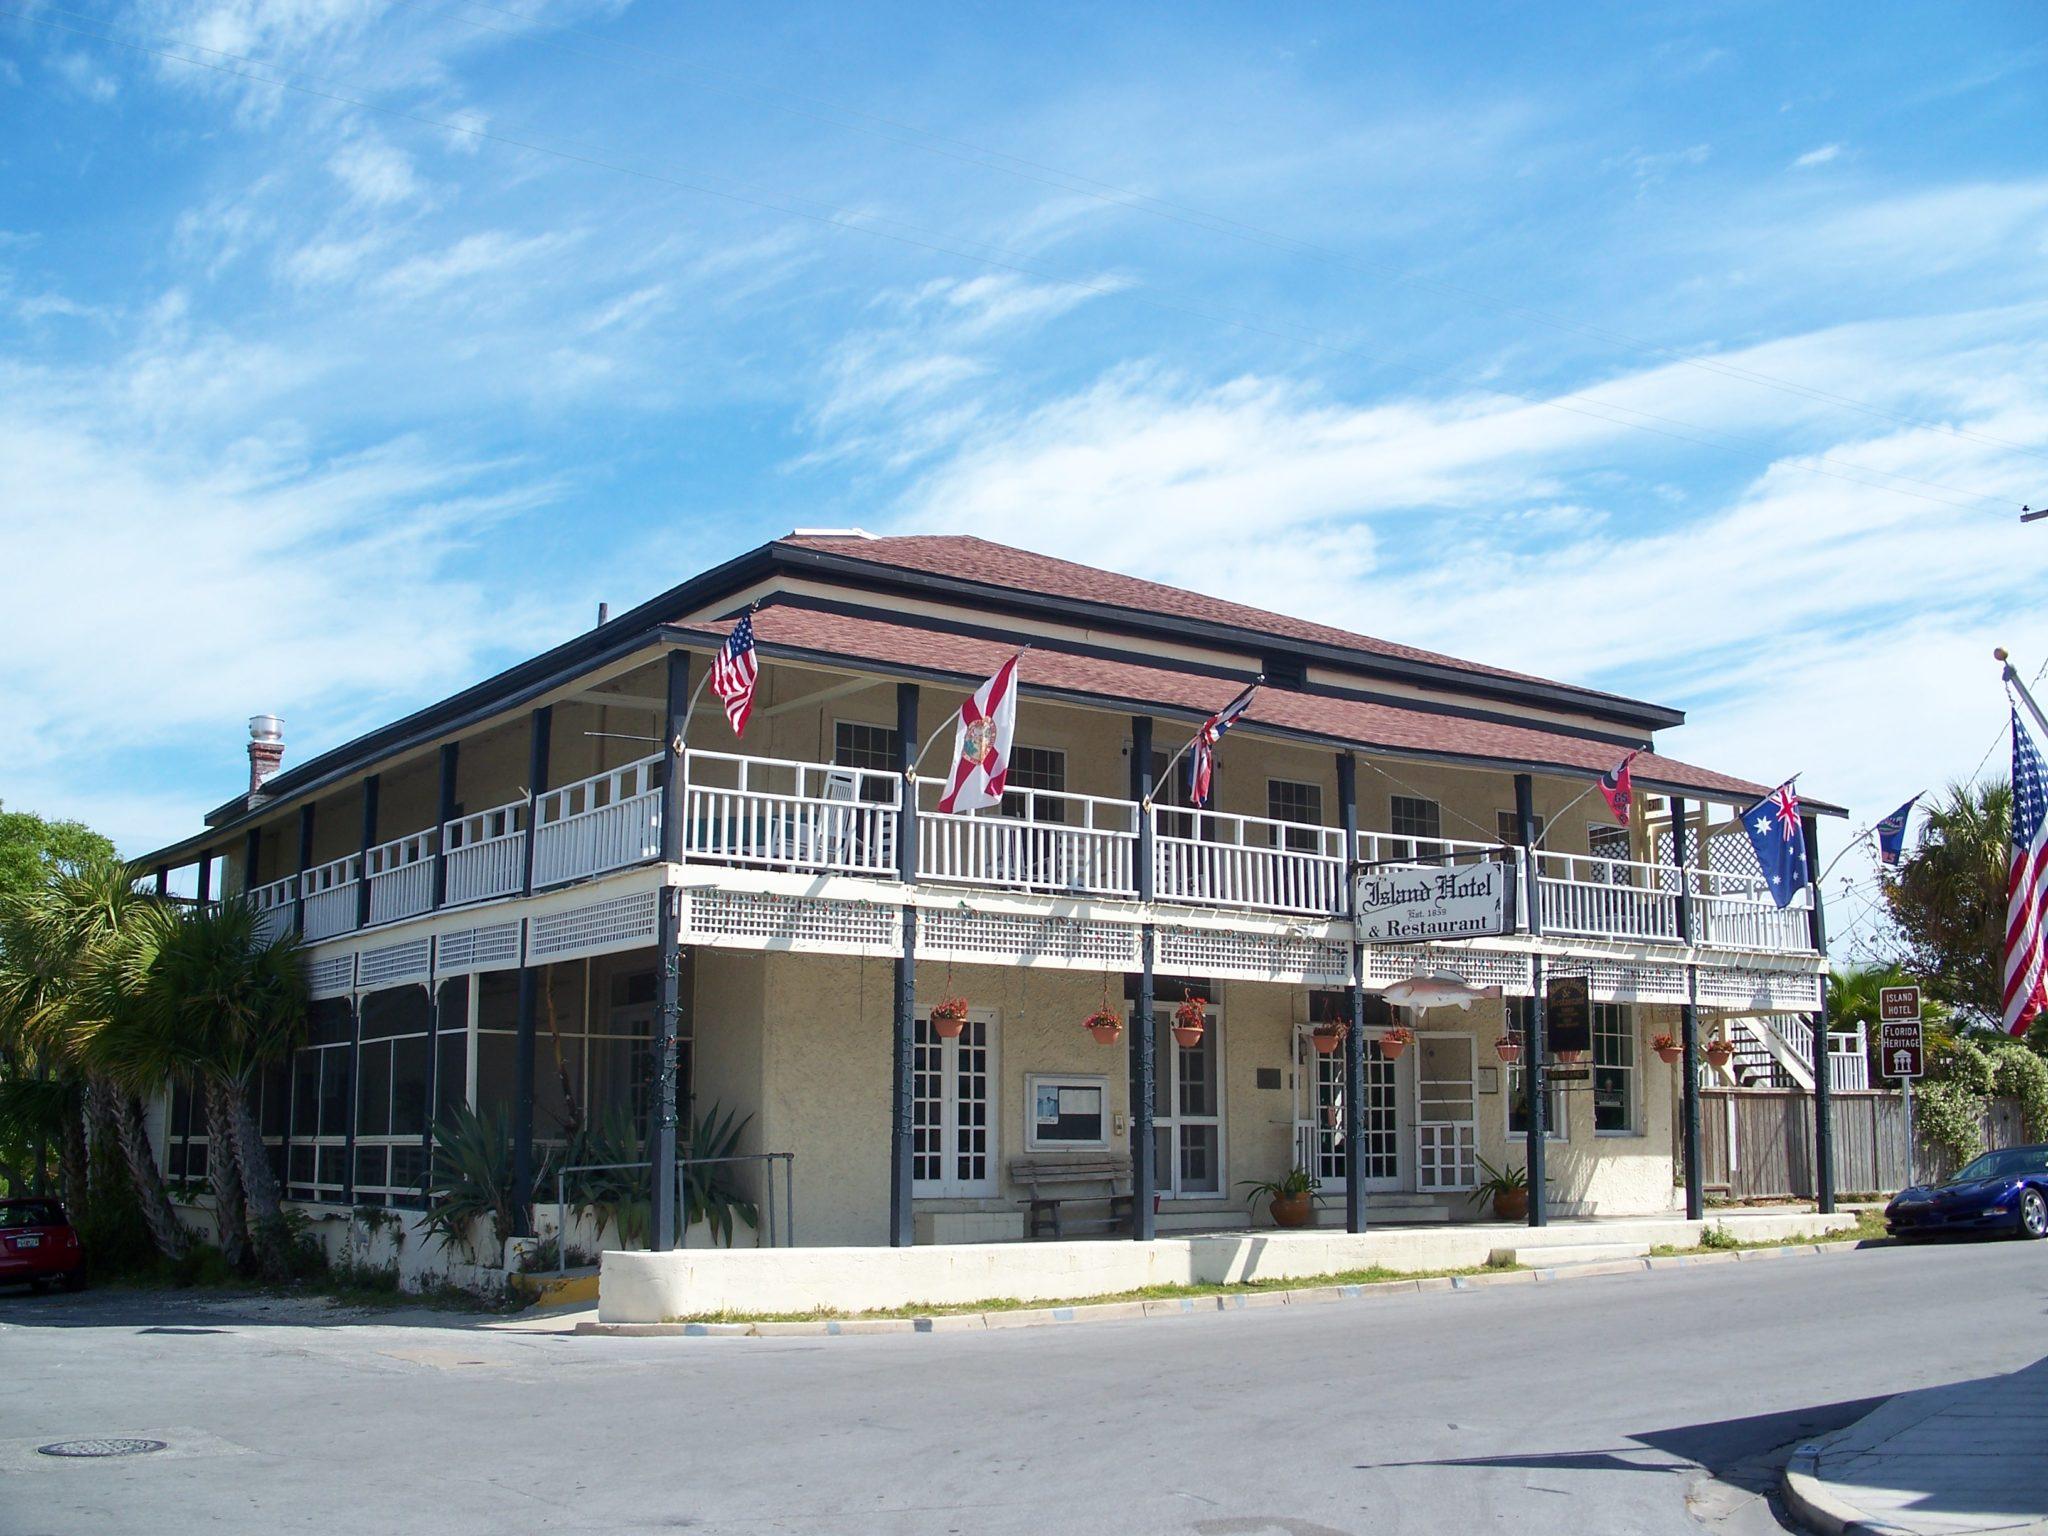 Island Hotel and Restaurant